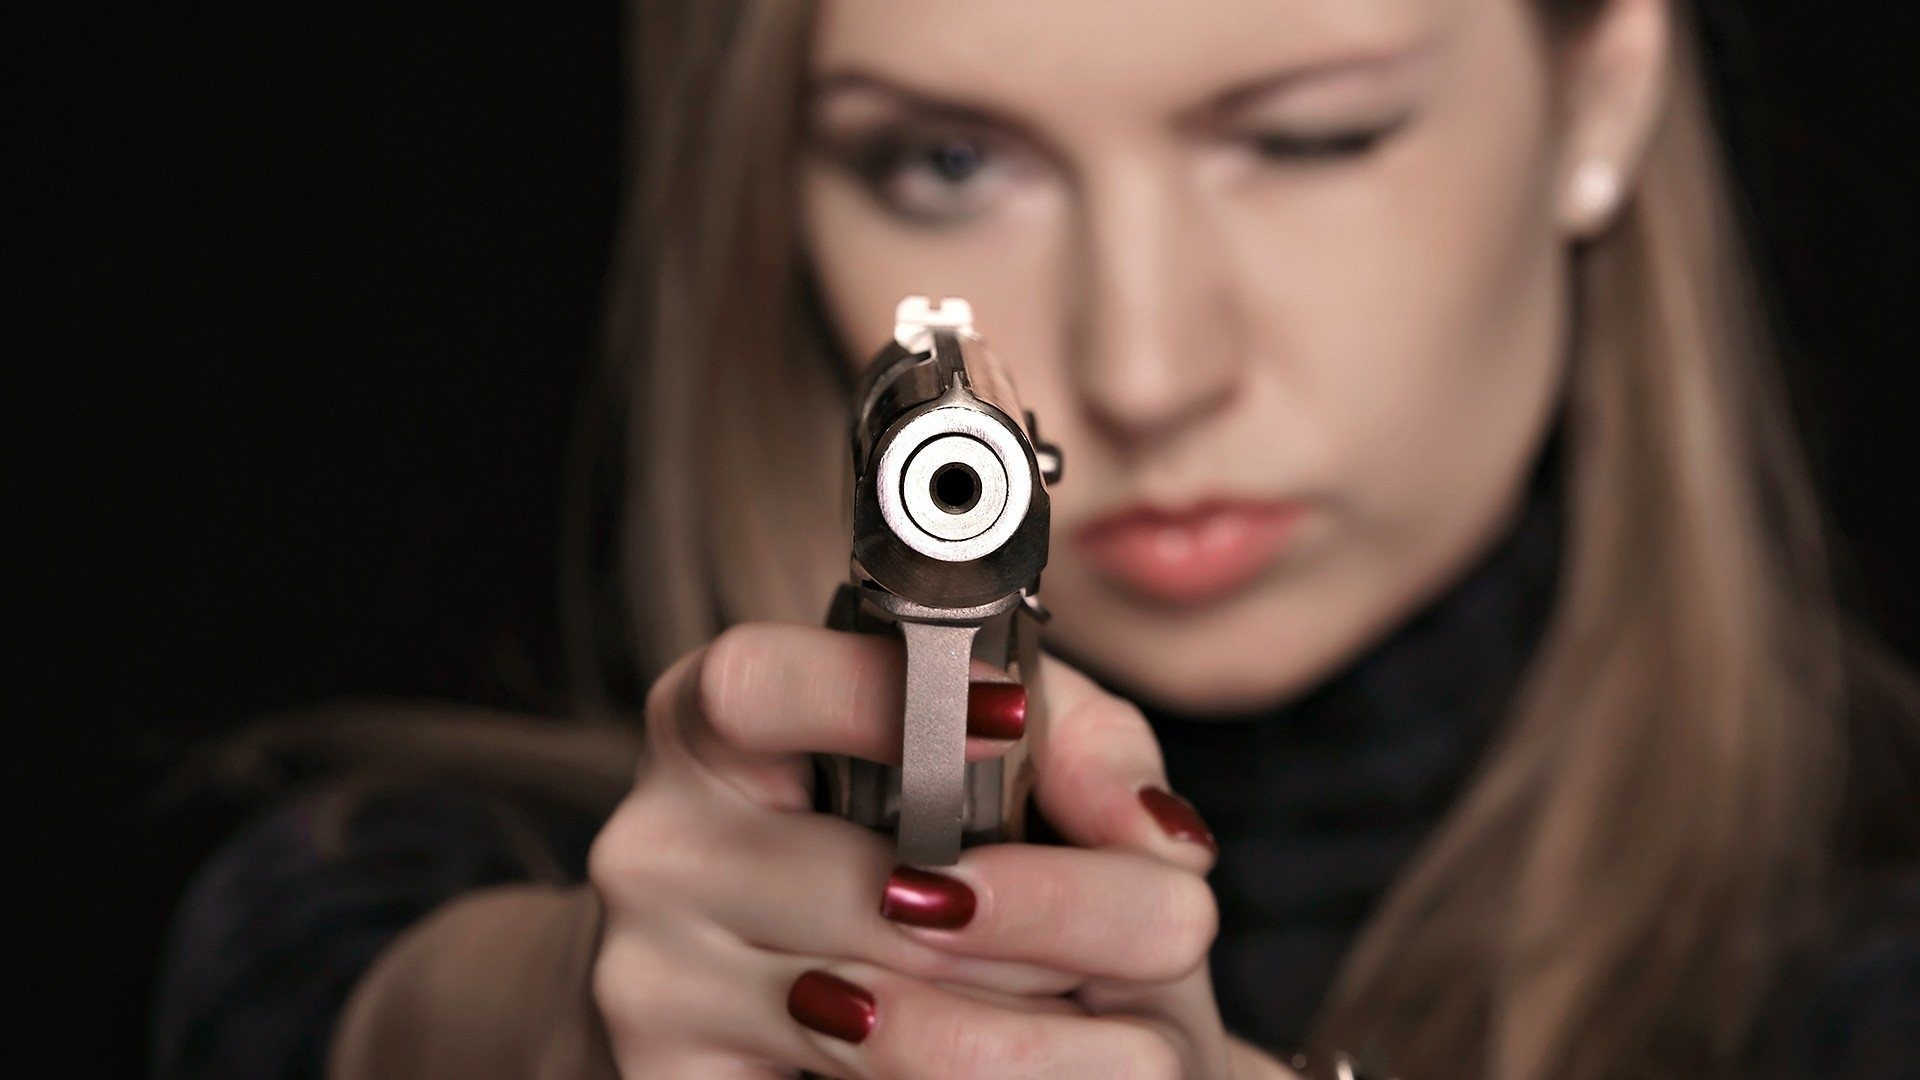 fantasy art girls with guns sniper wallpaper High 600×918 Chicks With Guns  Wallpapers (